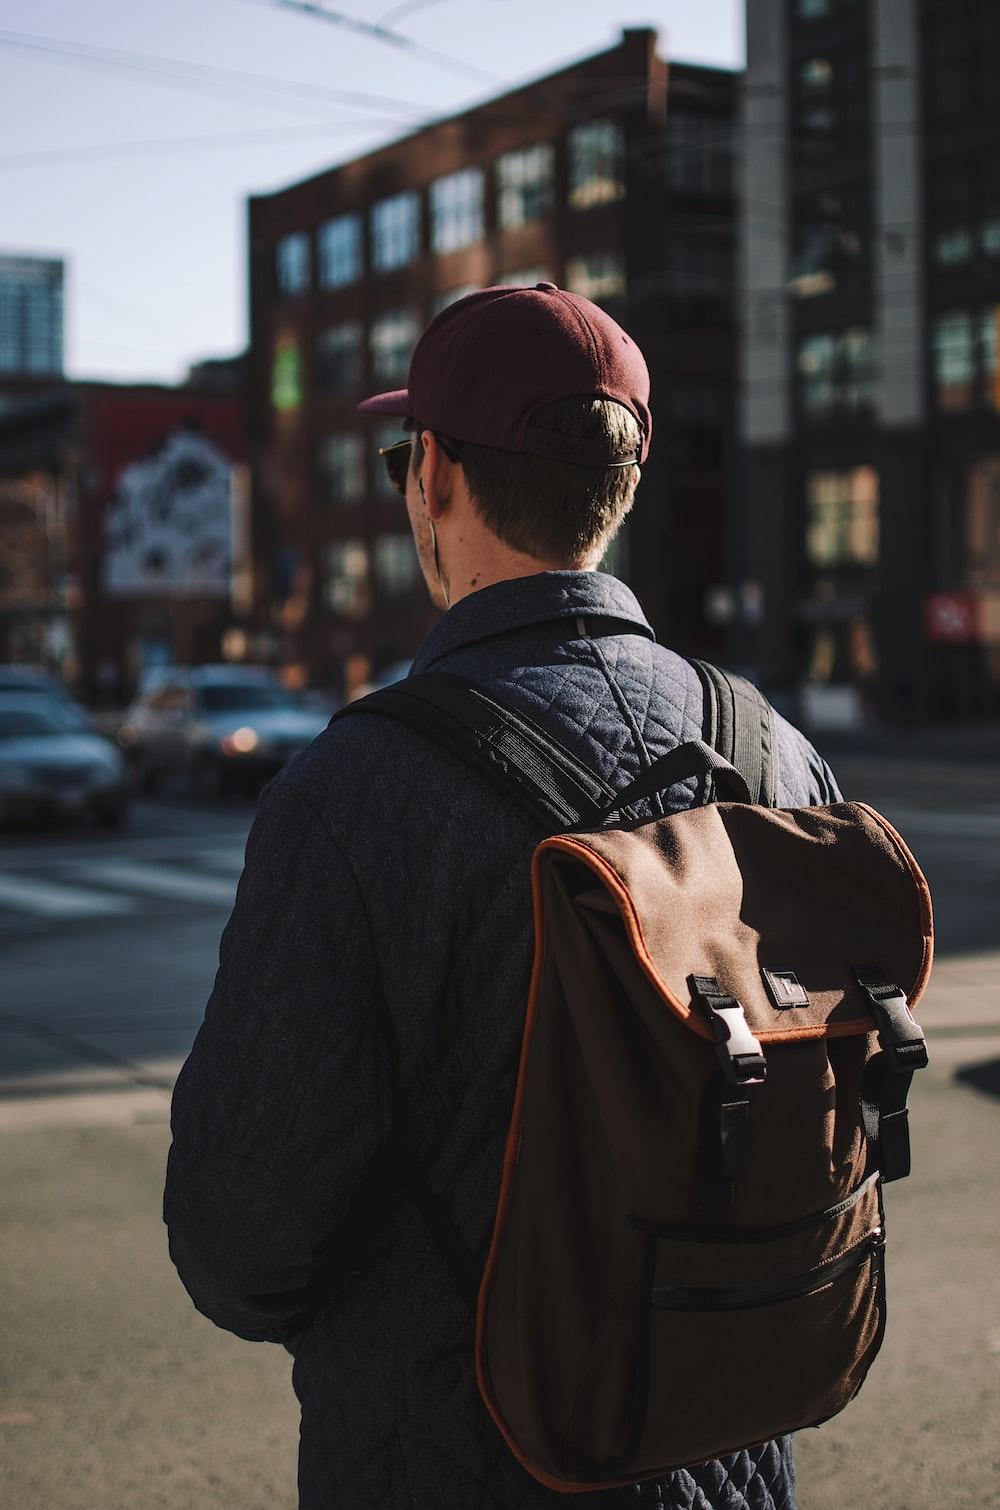 man wearing black jacket and cap standing near road looking forward